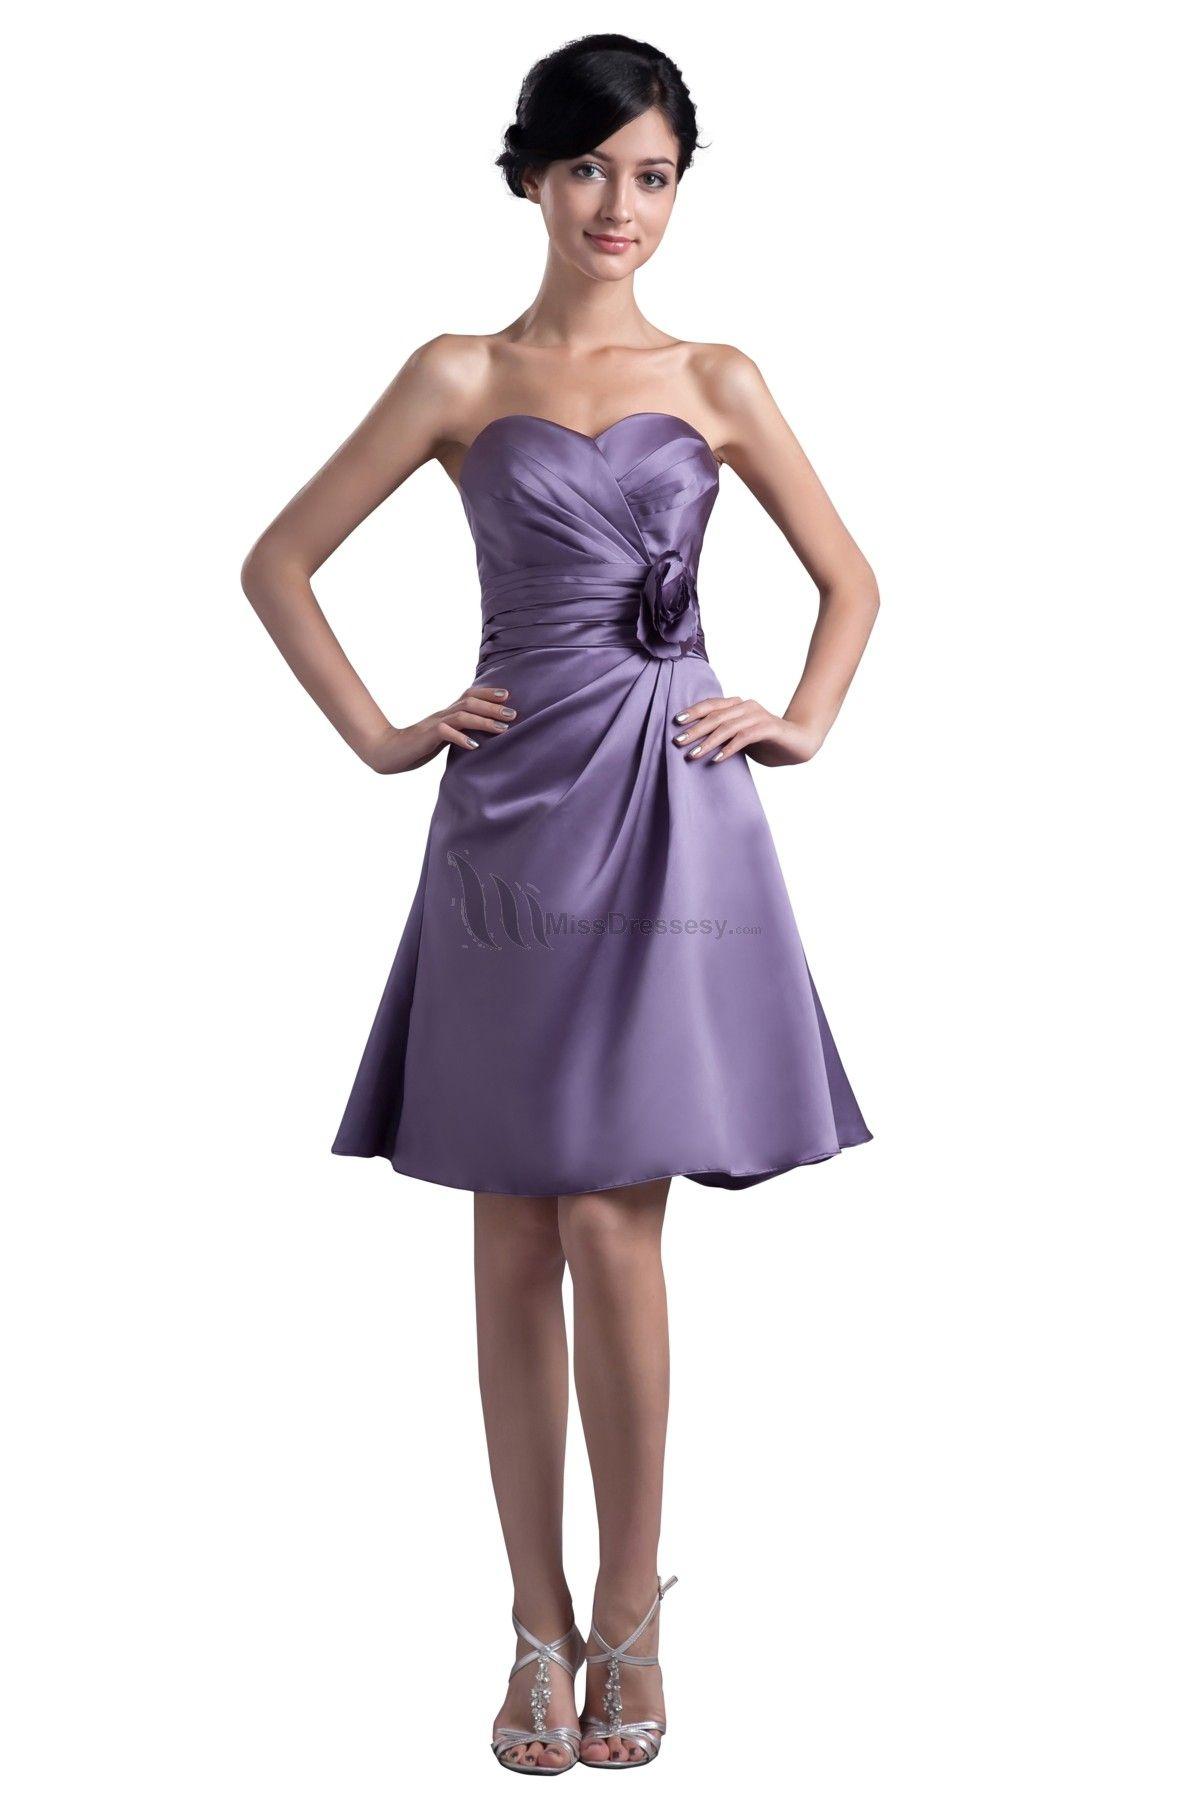 Buy Sweetheart Purple Elegant Short Bridesmaid Dress / Wedding Guest ...